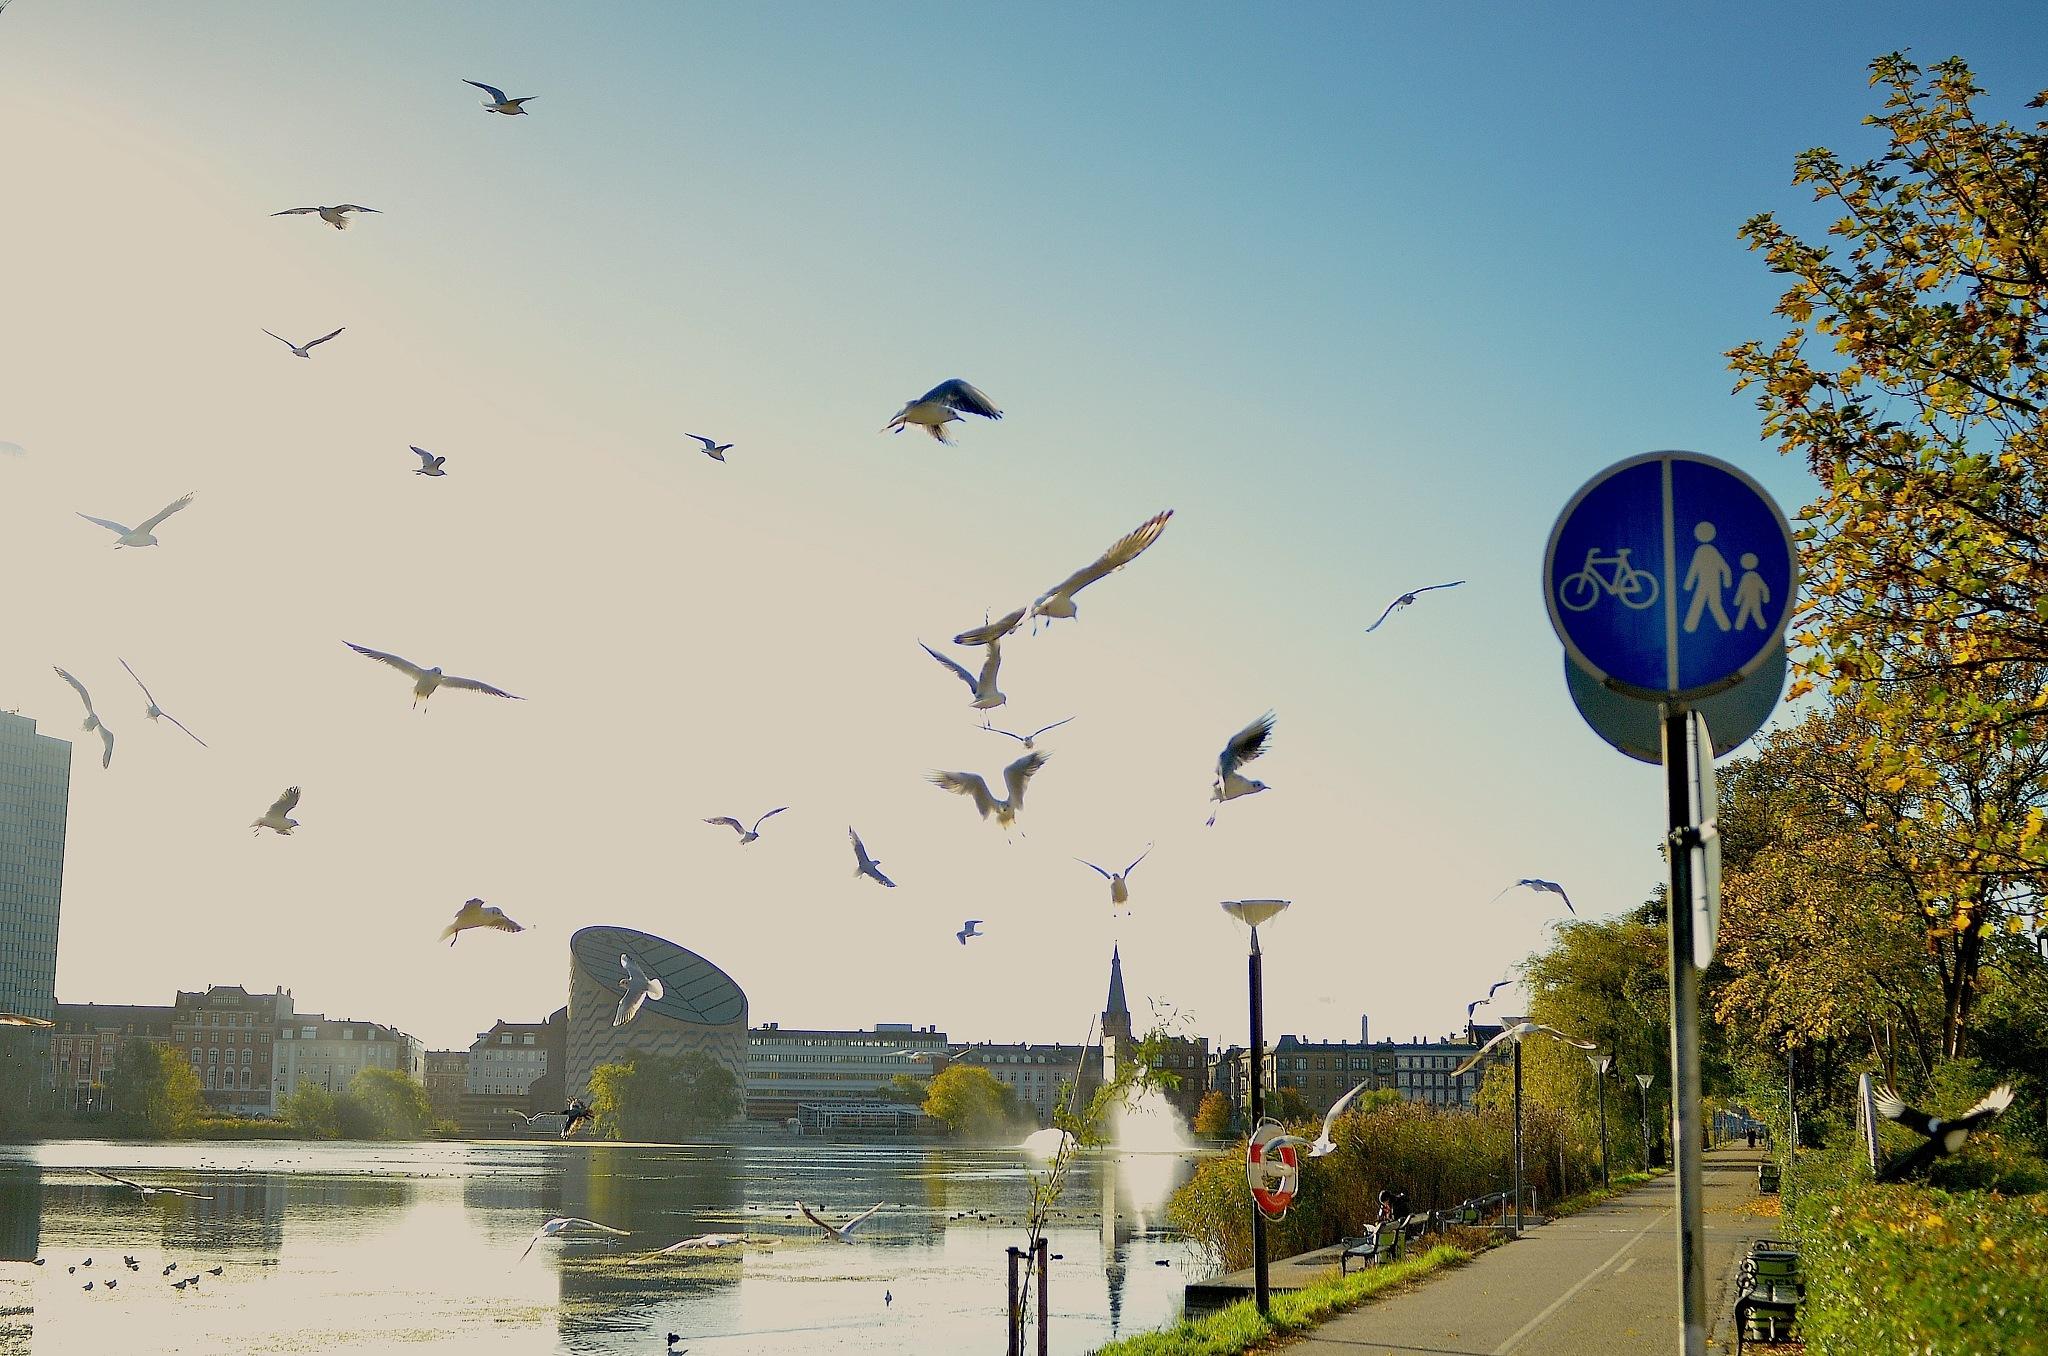 köpenhamn by Max Cesare Parodi